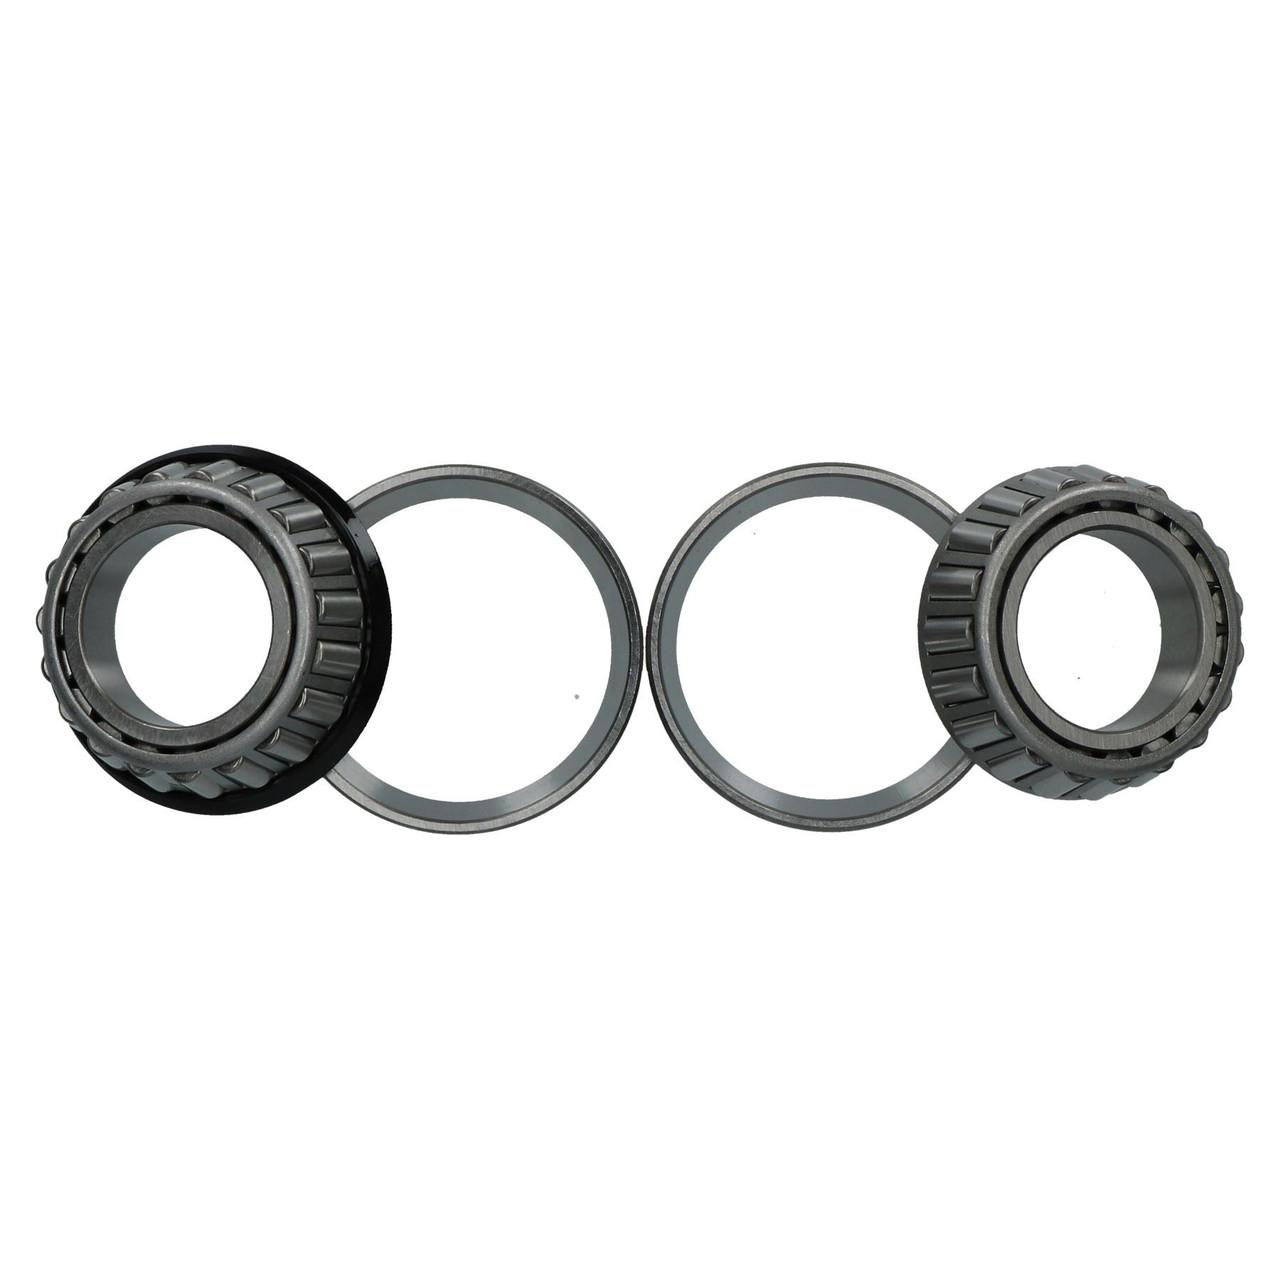 Trailer Taper Roller Bearing Kit Indespension Drum 9481 Ref ISHU047 48548//10